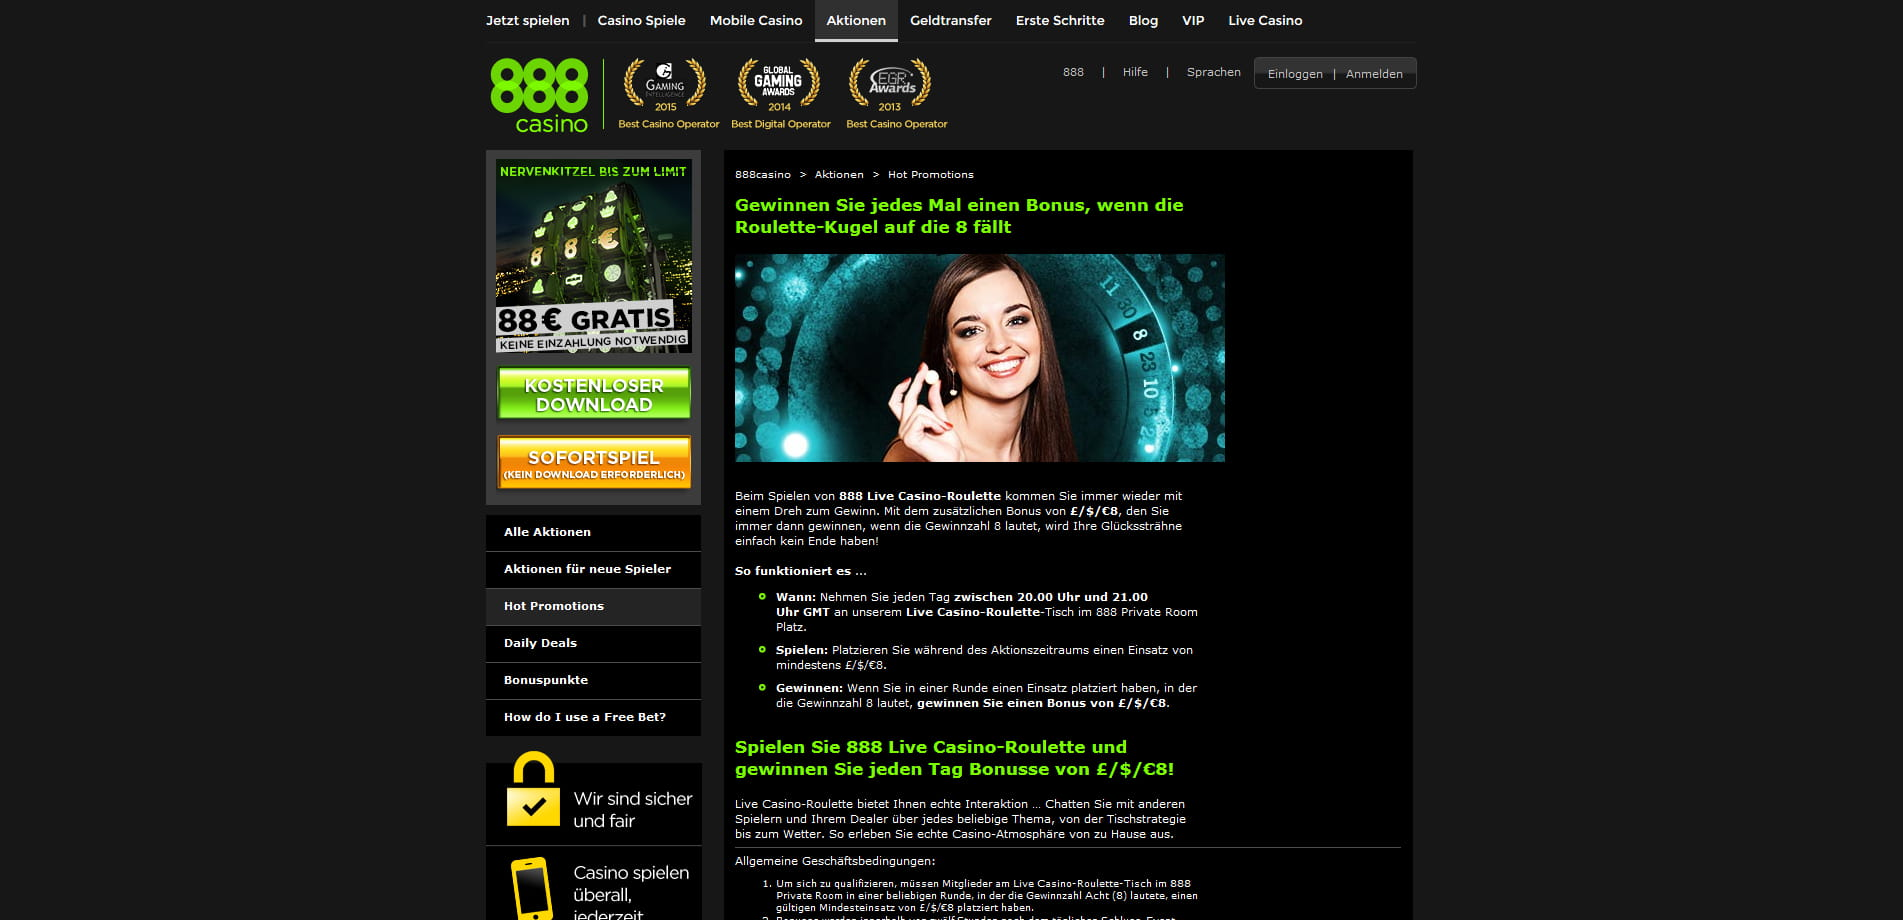 cash frenzy casino neu starten